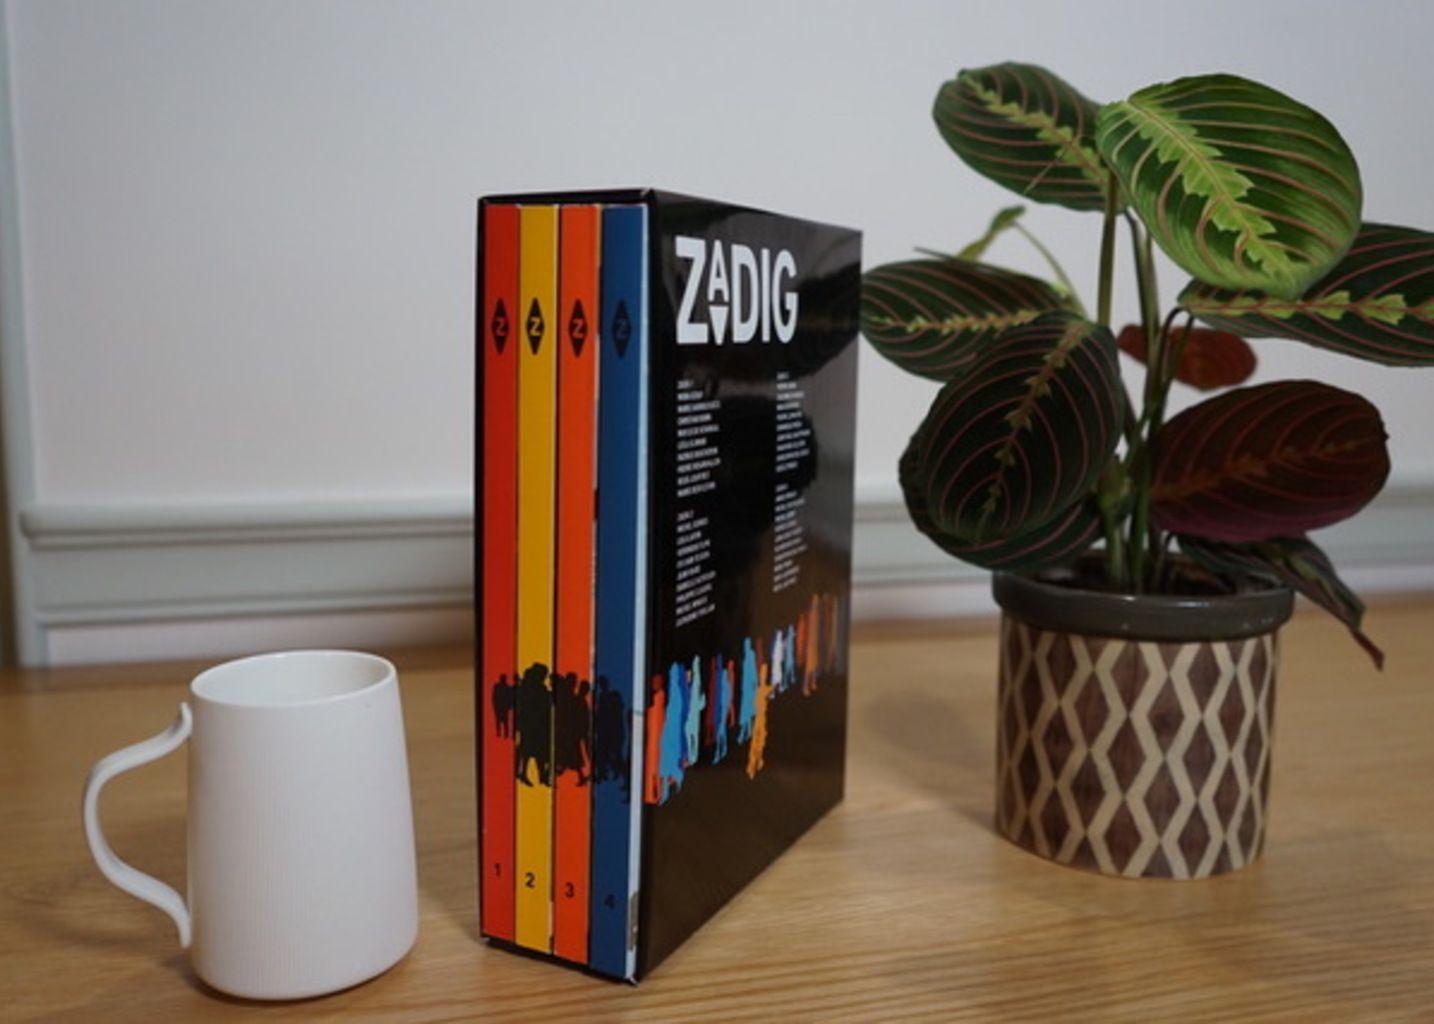 Coffret Zadig - La Librairie